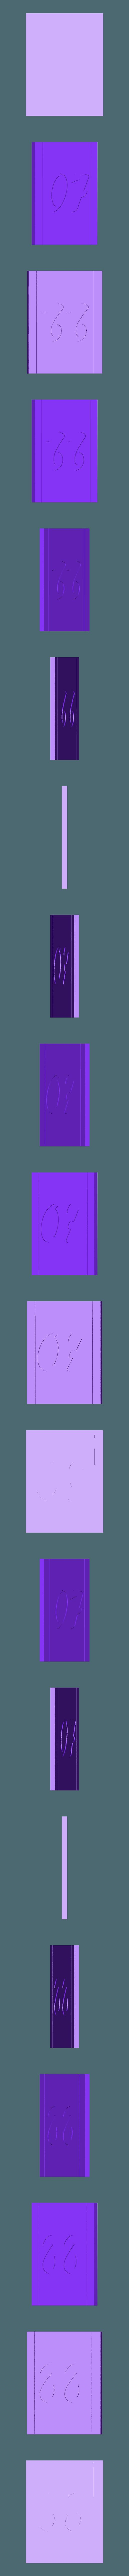 7_-_22.stl Download free SCAD file Perpetual Flip Calendar (W/ Customizable Font) • 3D printable model, Dsk